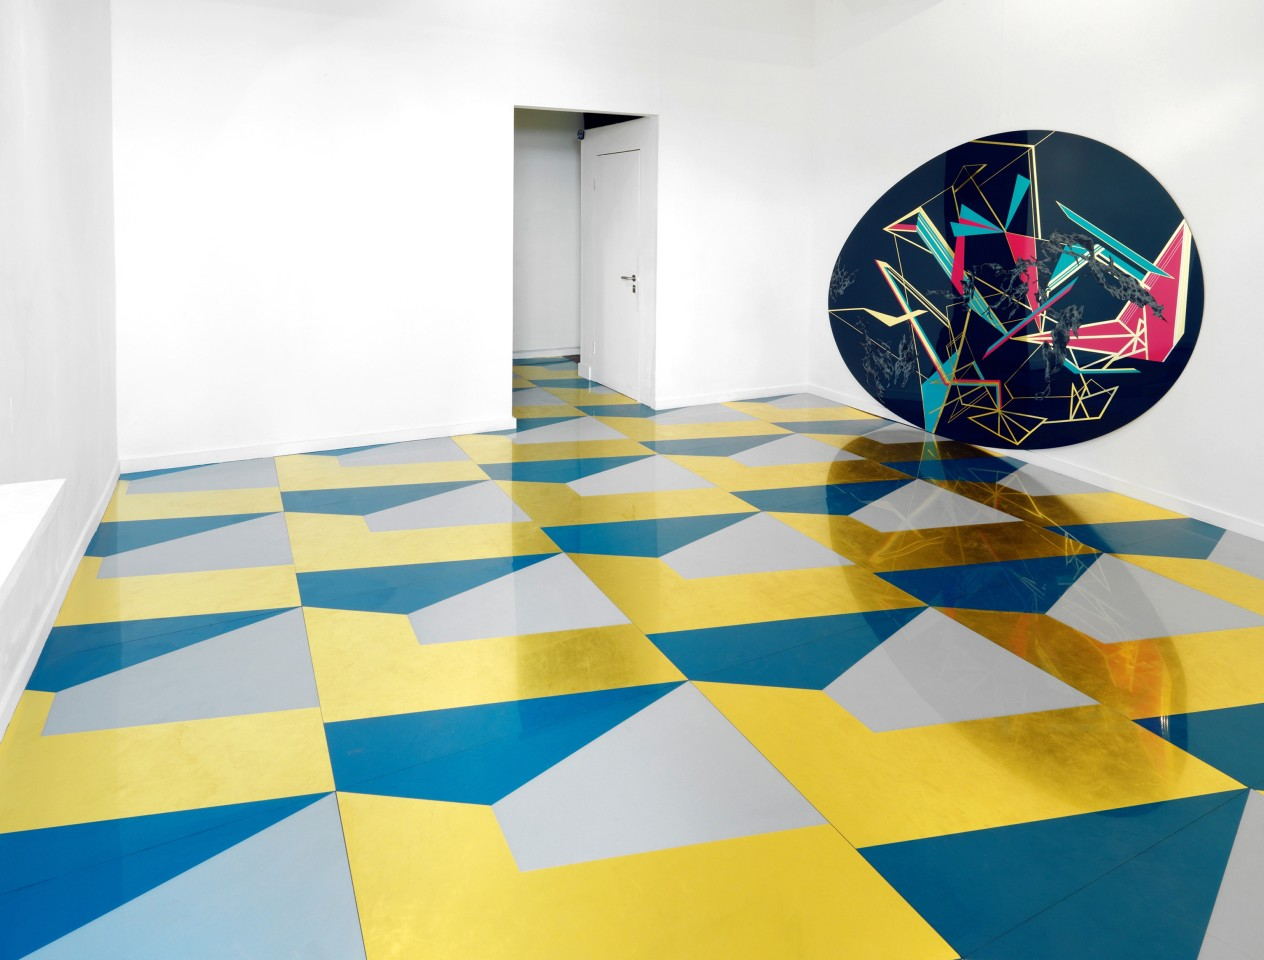 Sinta Tantra, Real Phoney Floor, 2009